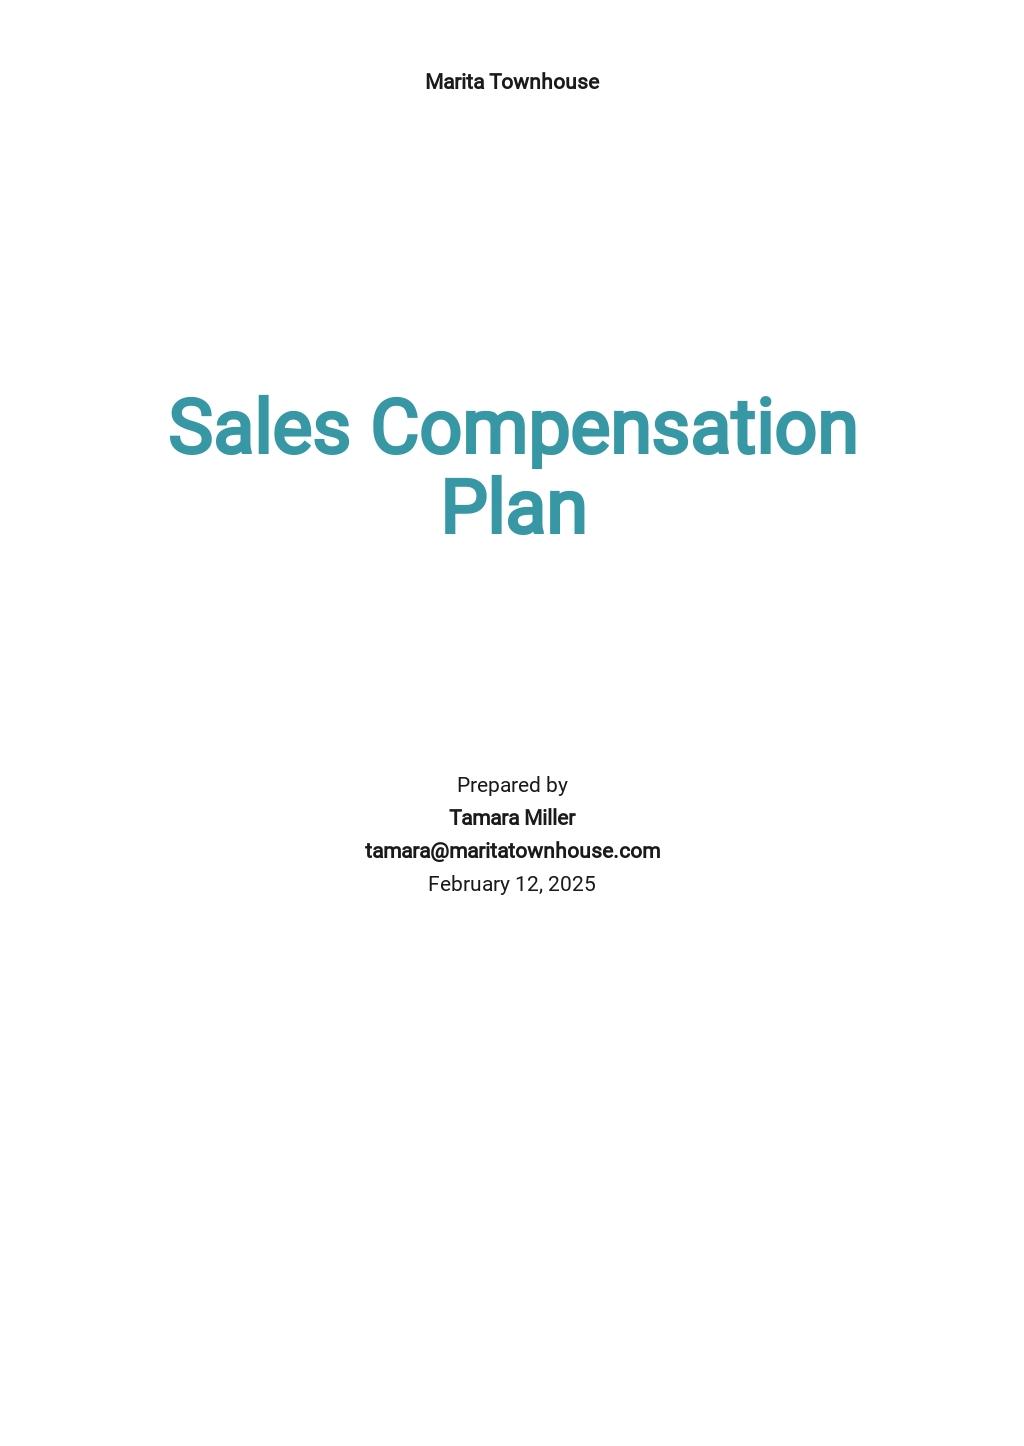 Sales Compensation Plan Template.jpe